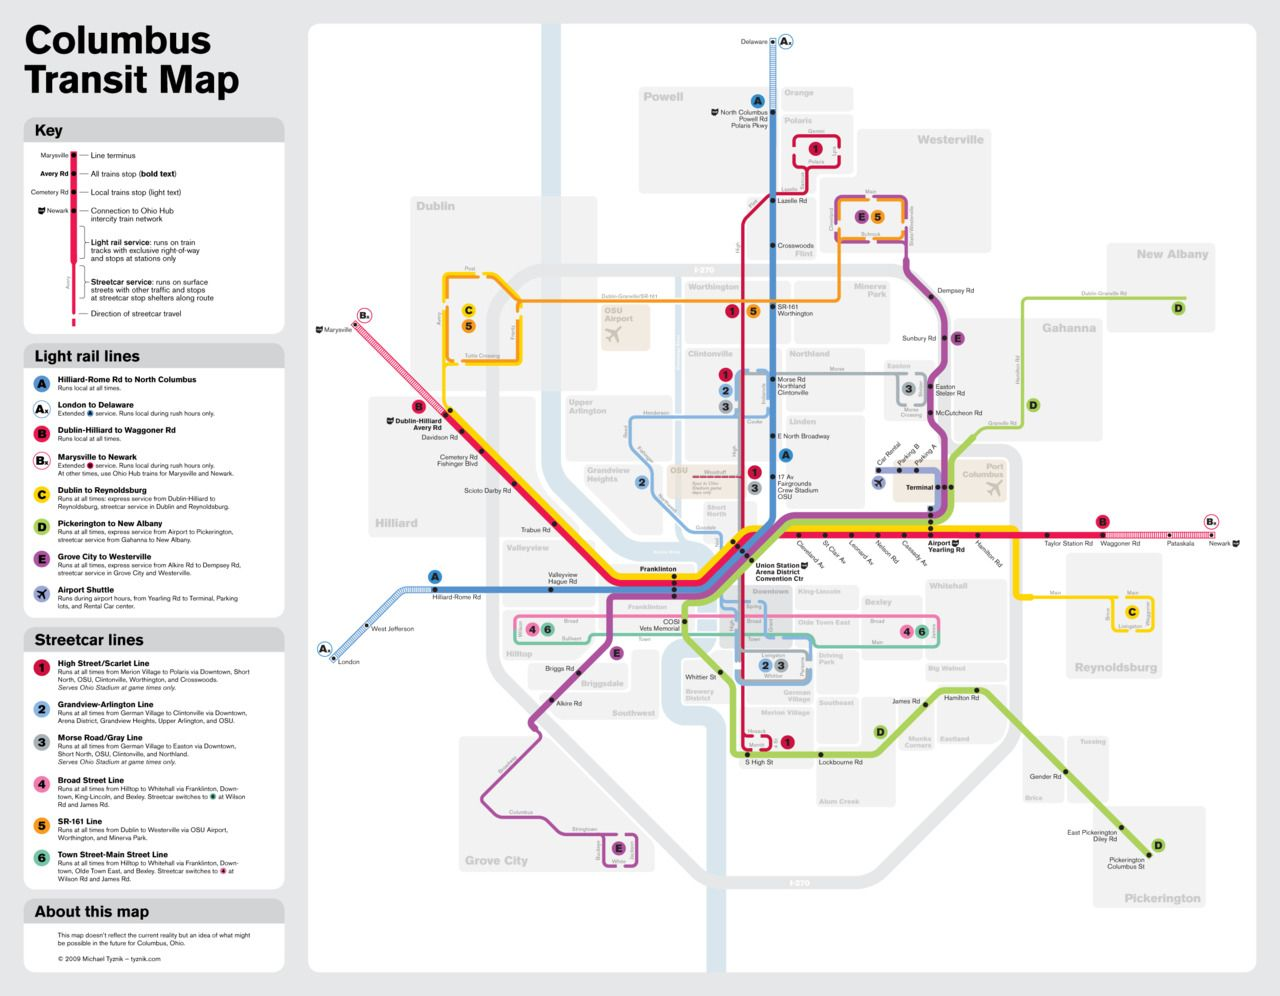 NJ Transit Map Tres Important Travel Sources Pinterest - Chicago el map poster